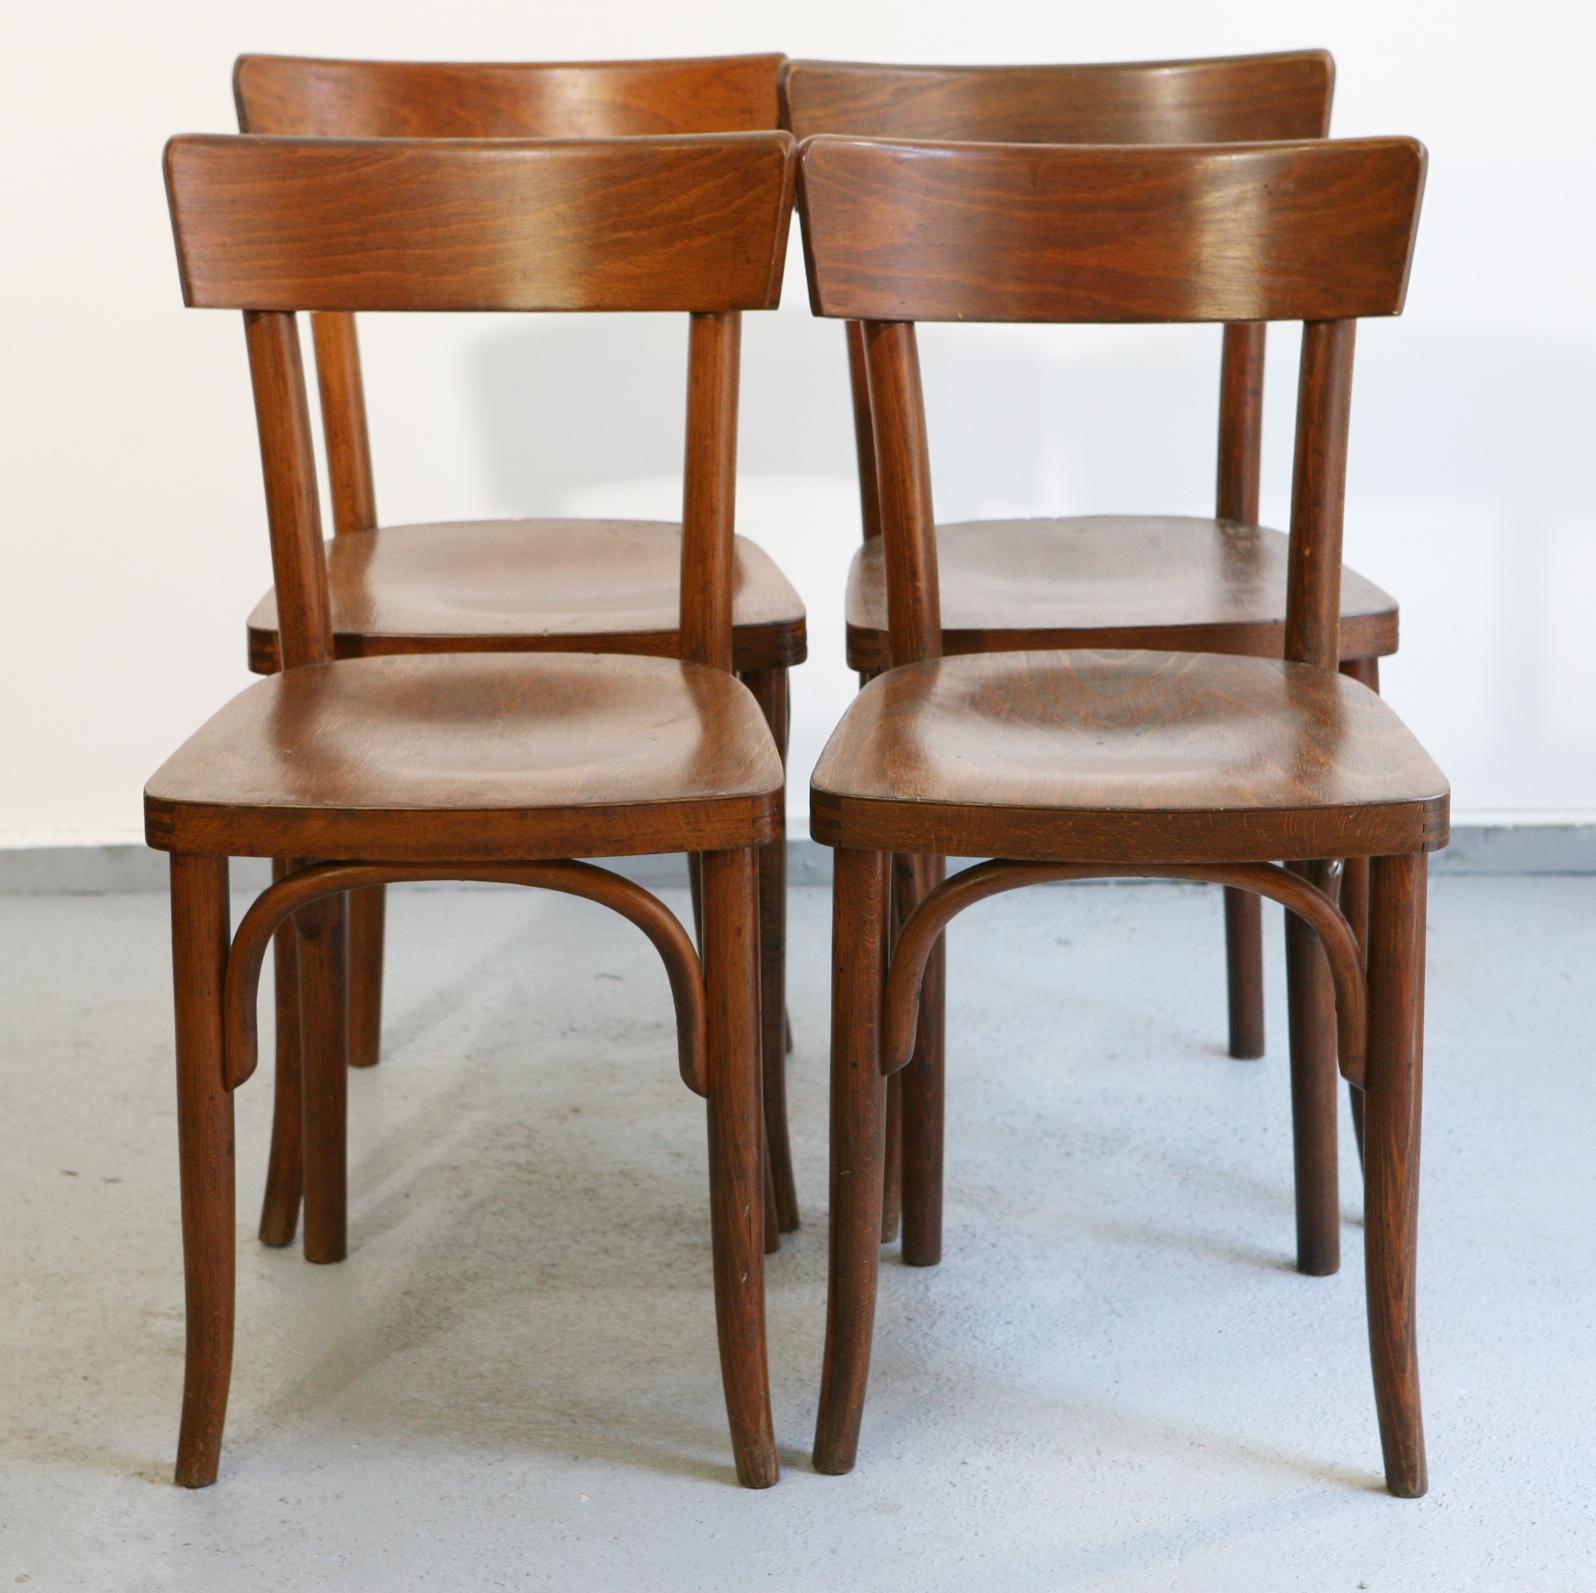 baos lot de 4 chaises bistrot. Black Bedroom Furniture Sets. Home Design Ideas